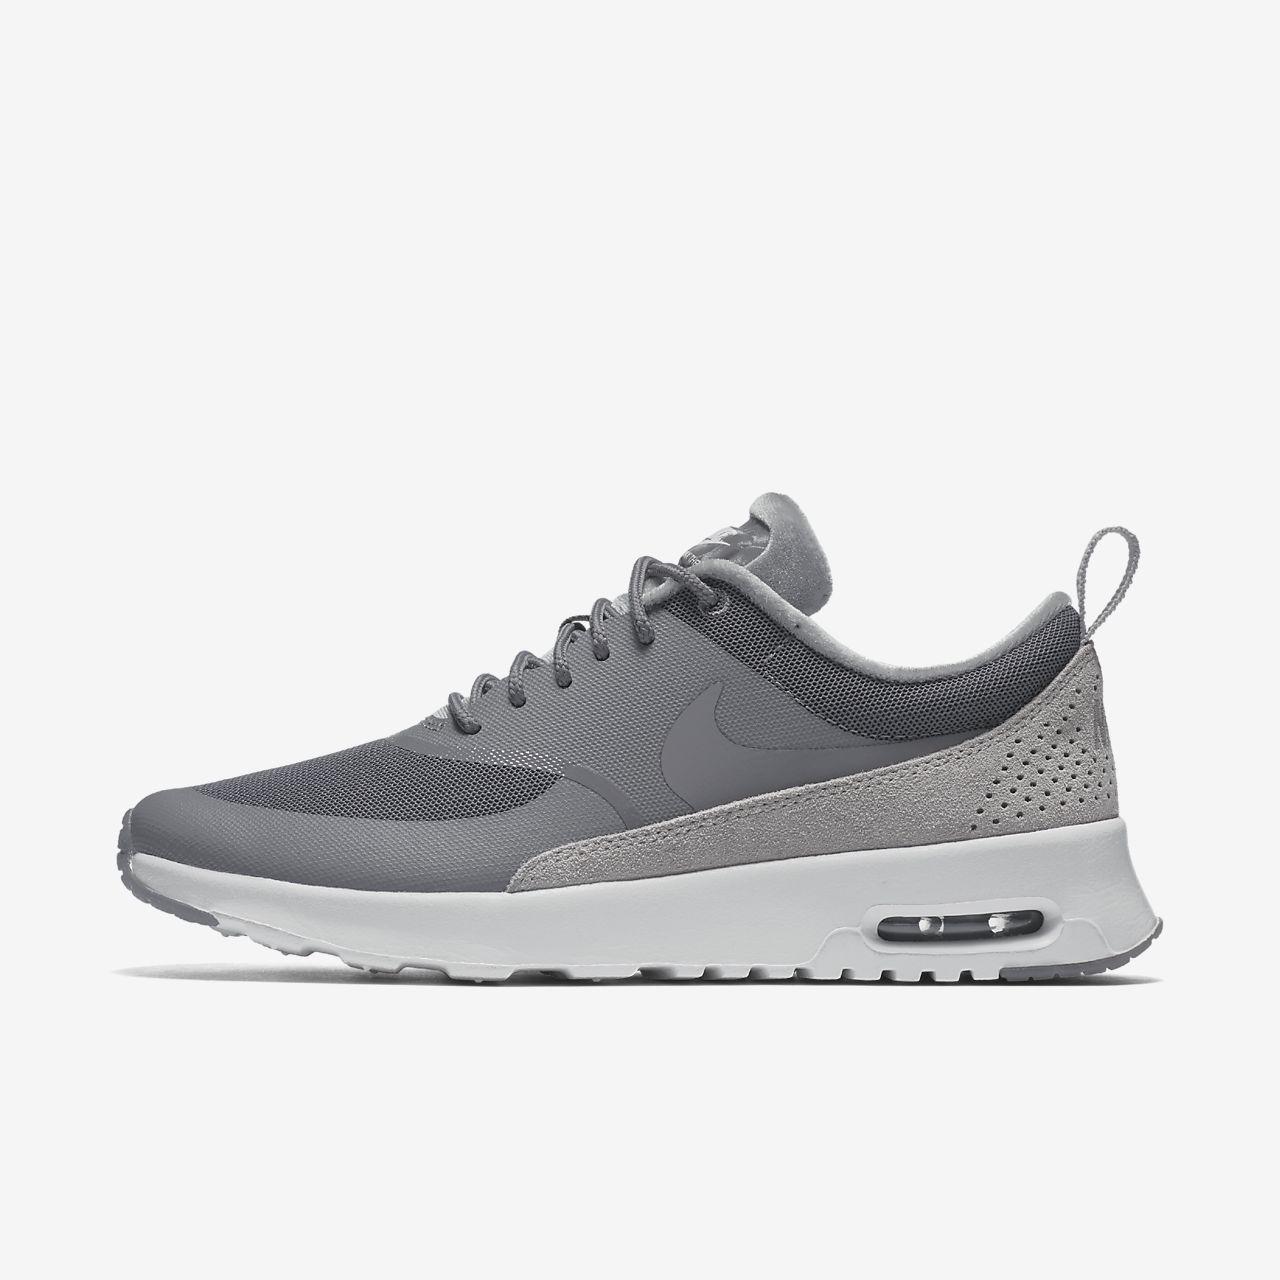 ... Chaussure Nike Air Max Thea LX pour Femme